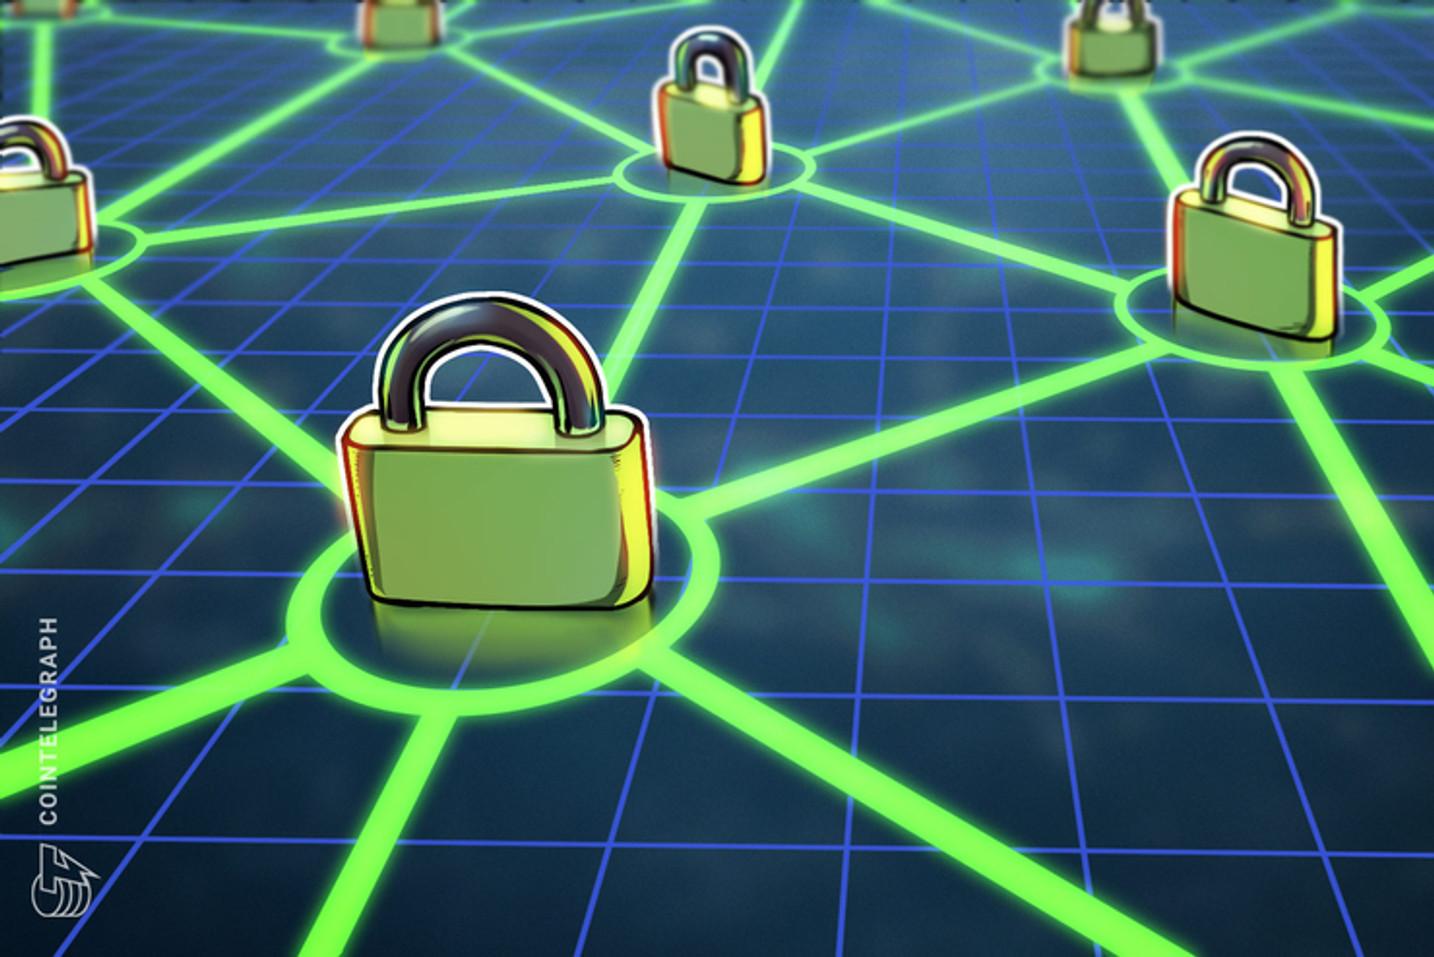 Programador de Bitcoin defende uso de 'cofres' na rede para aumentar segurança de cold storage